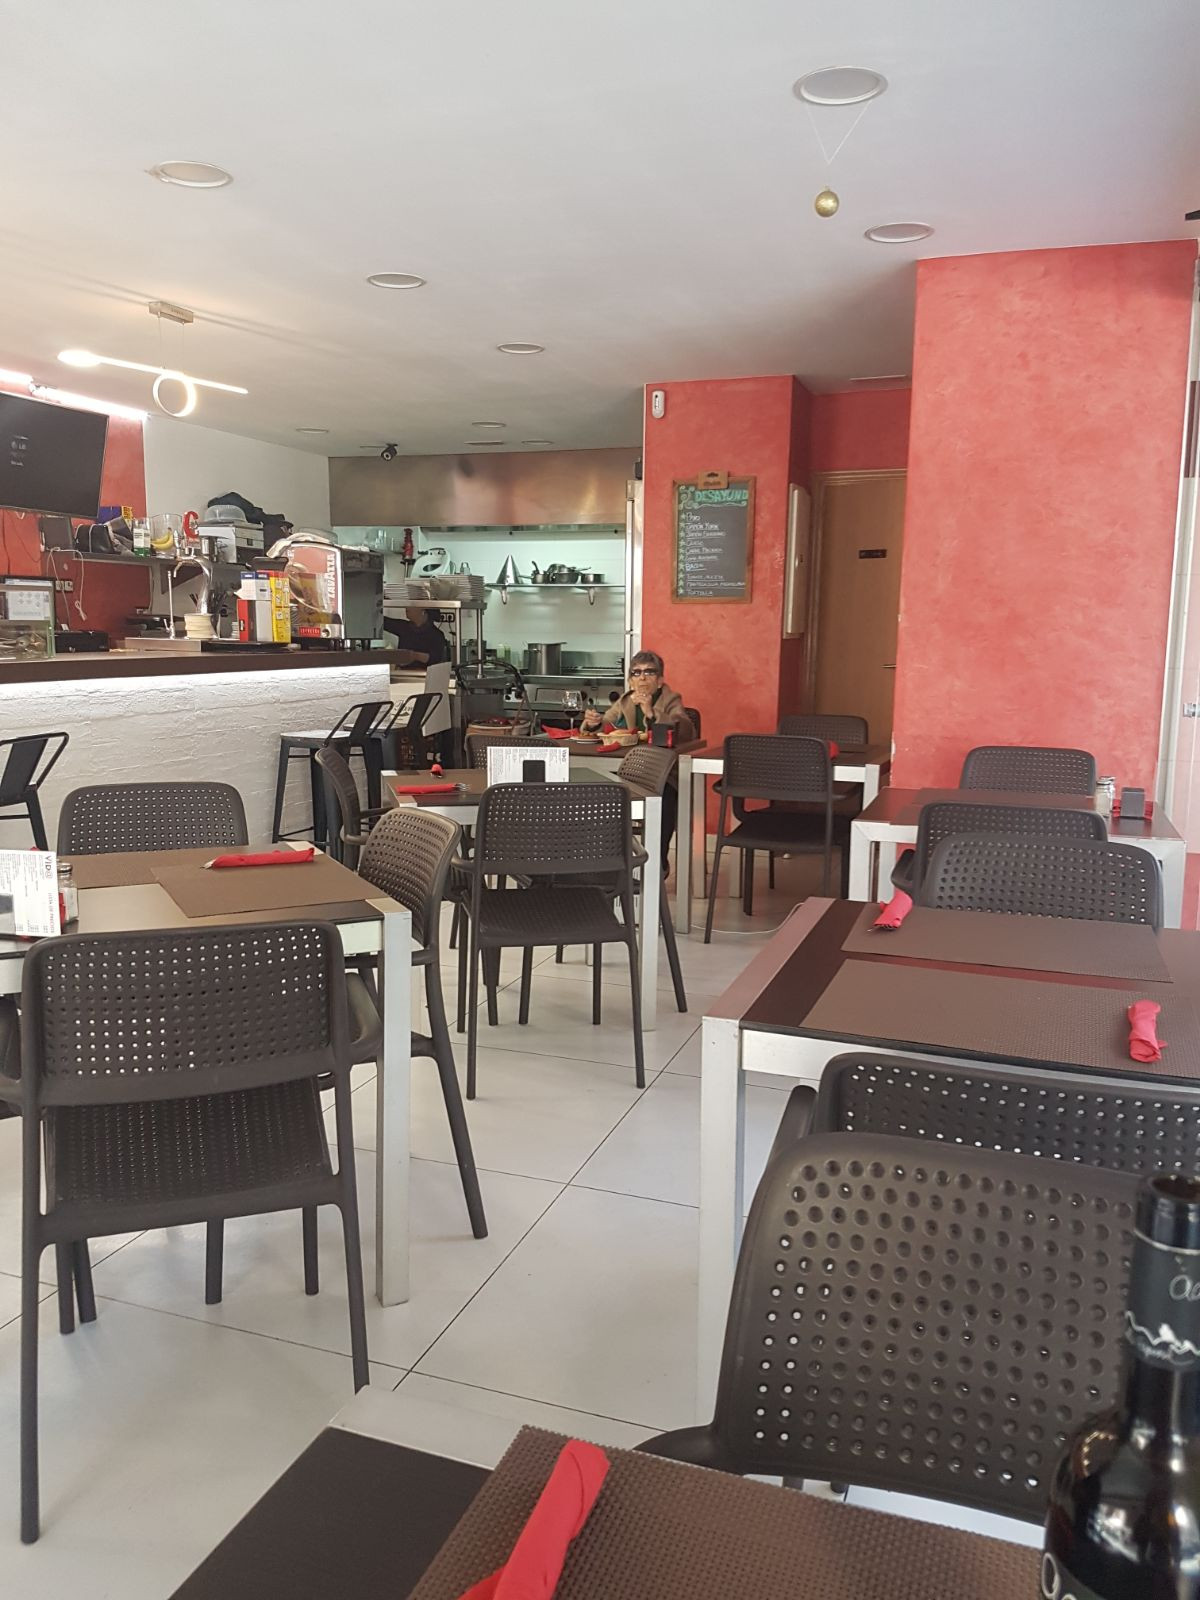 Commercial Premises for rent en Marbella Centro, Marbella